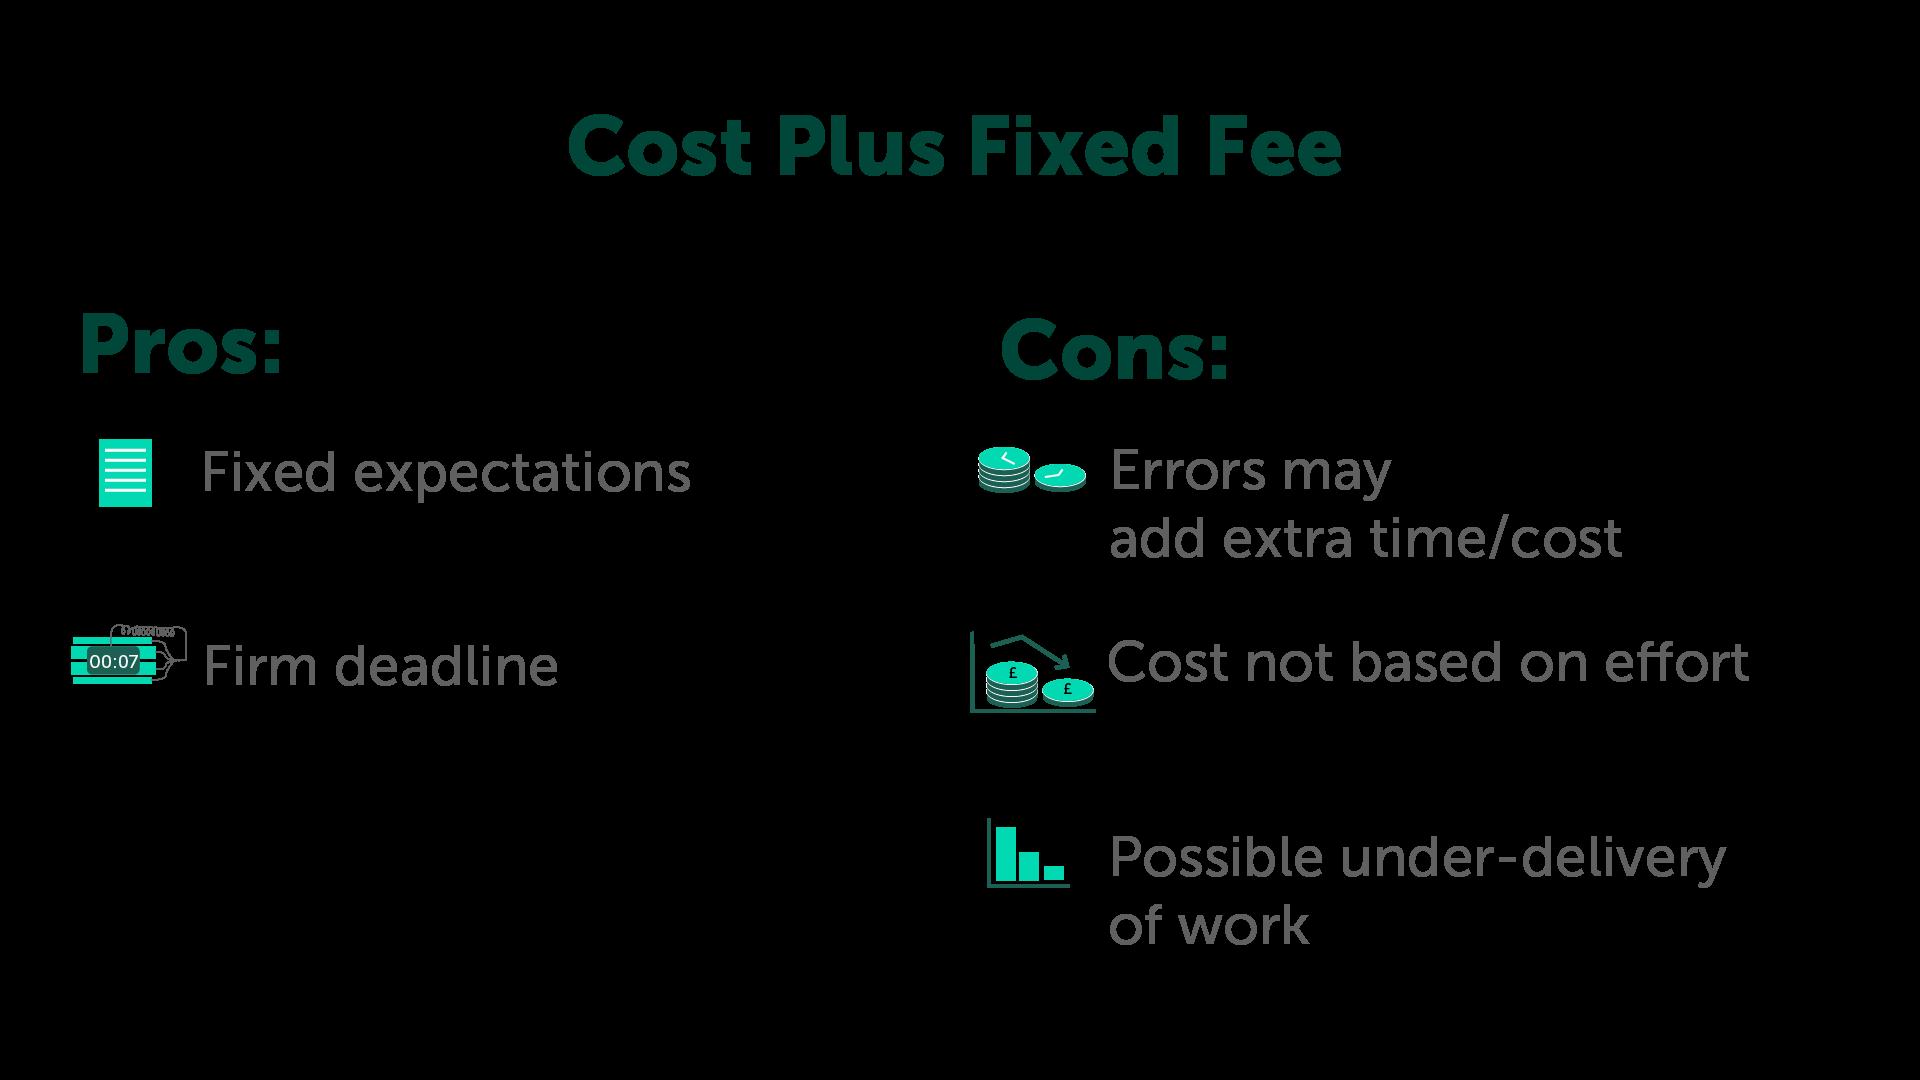 Cost Plus Fixed Fee